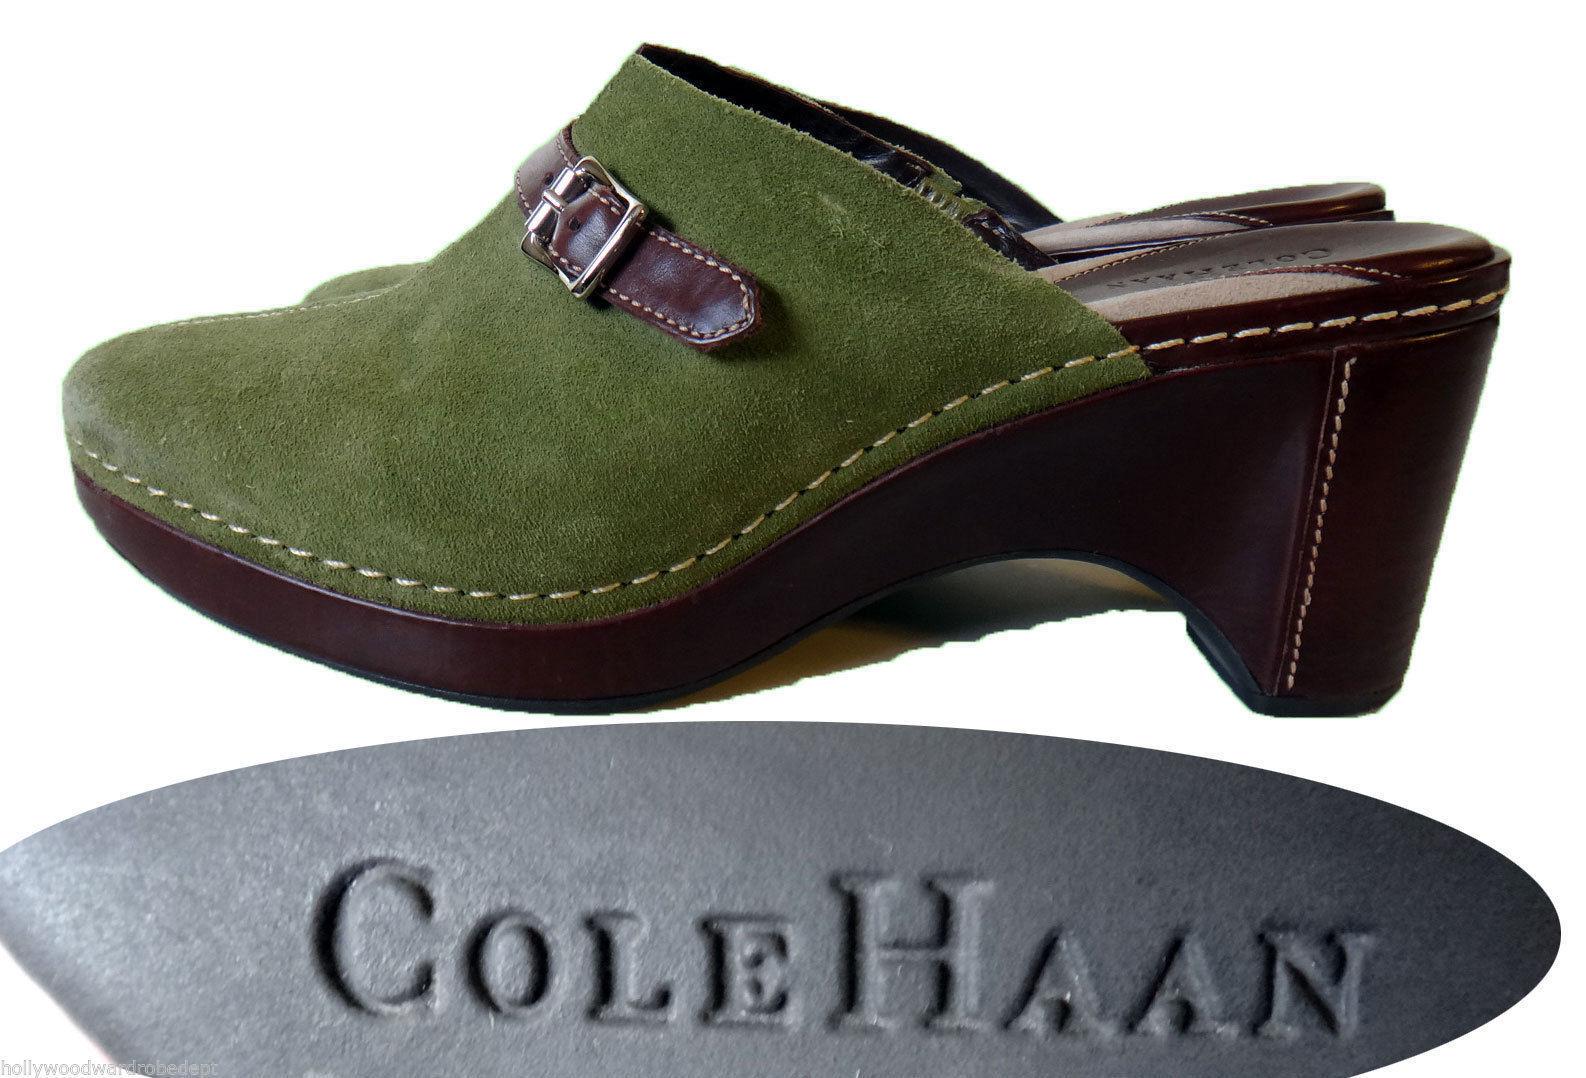 Cole Haan Green suede Leder slip on MULE clog 9 B olive 3 inch heel 40 buckle